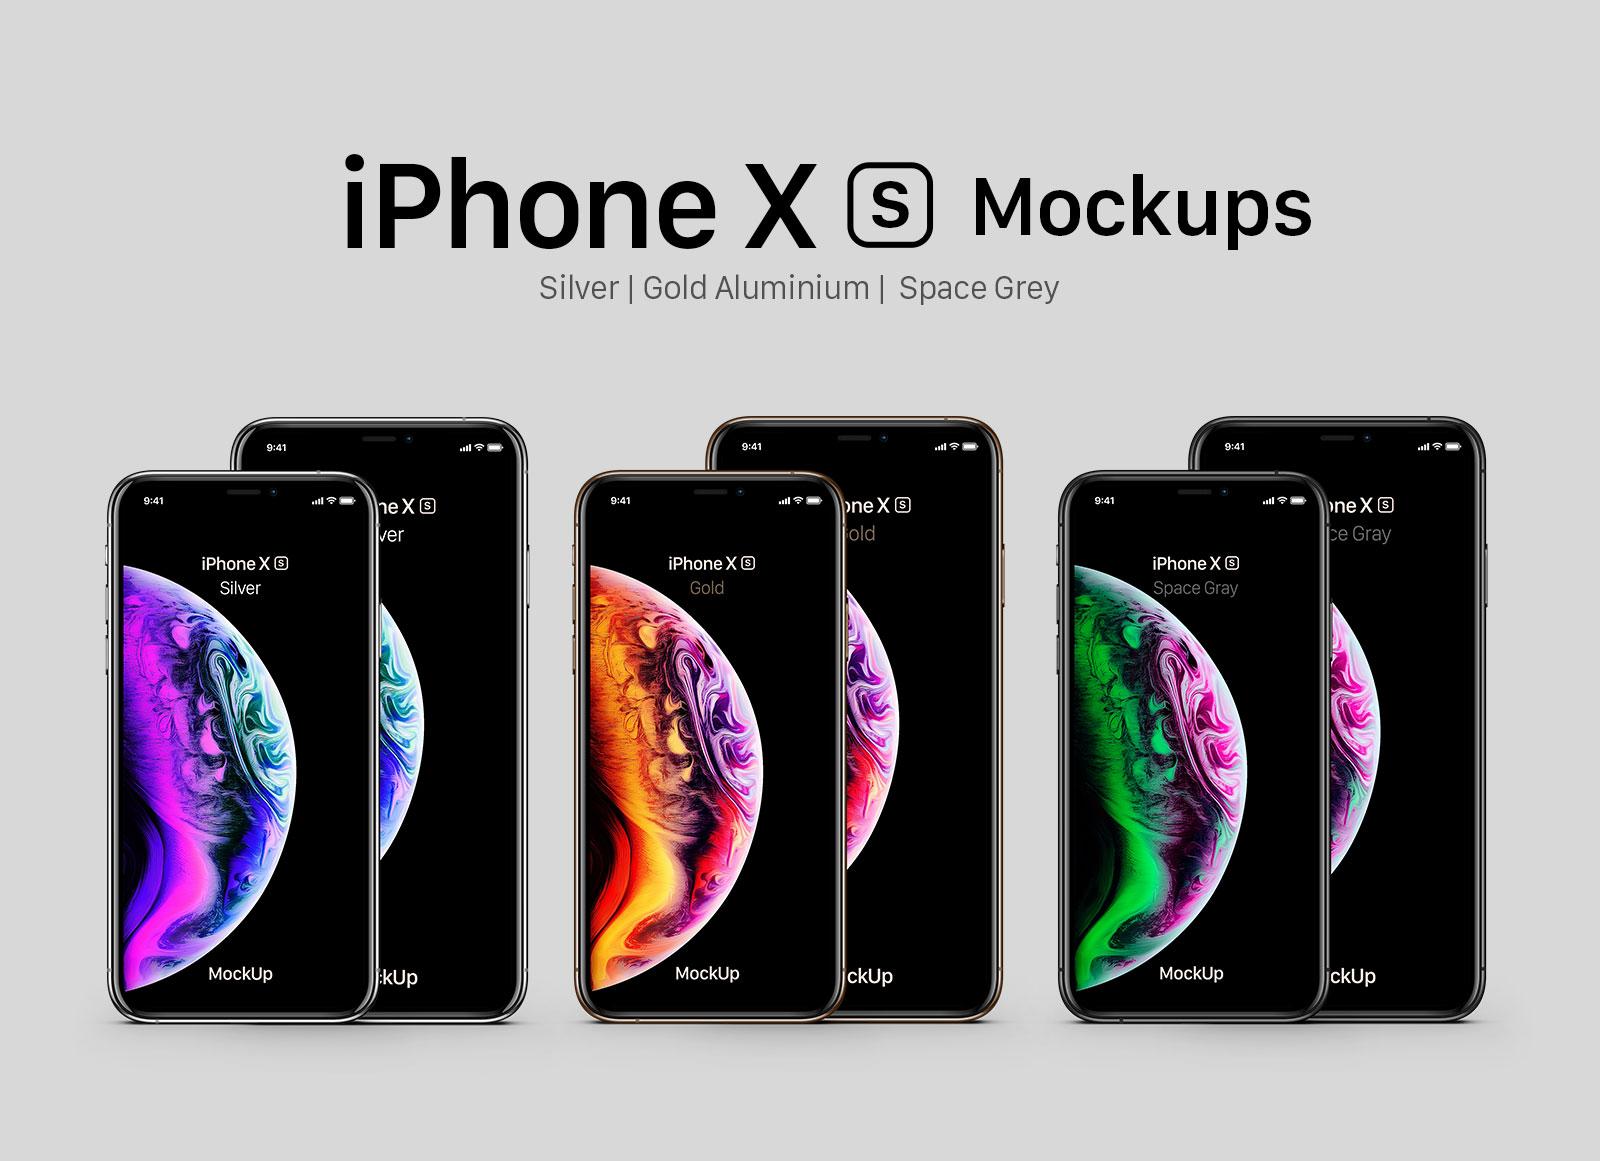 Free-iPhone-Xs-&-Xs-Max-Mockup-PSD-Set-2